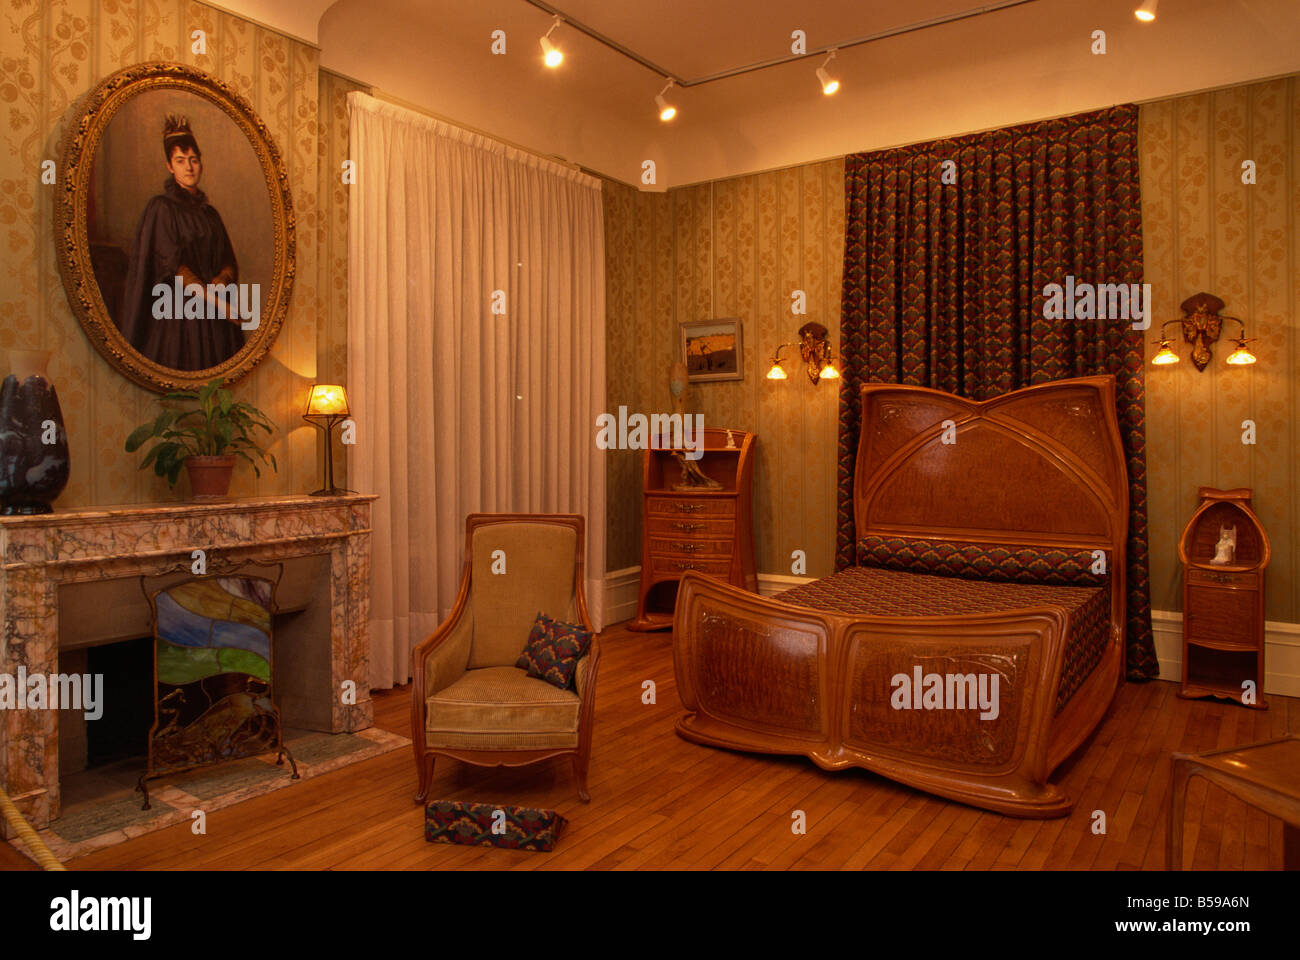 Jugendstil Schlafzimmer Innenraum Im Musee De L Ecole De Nancy